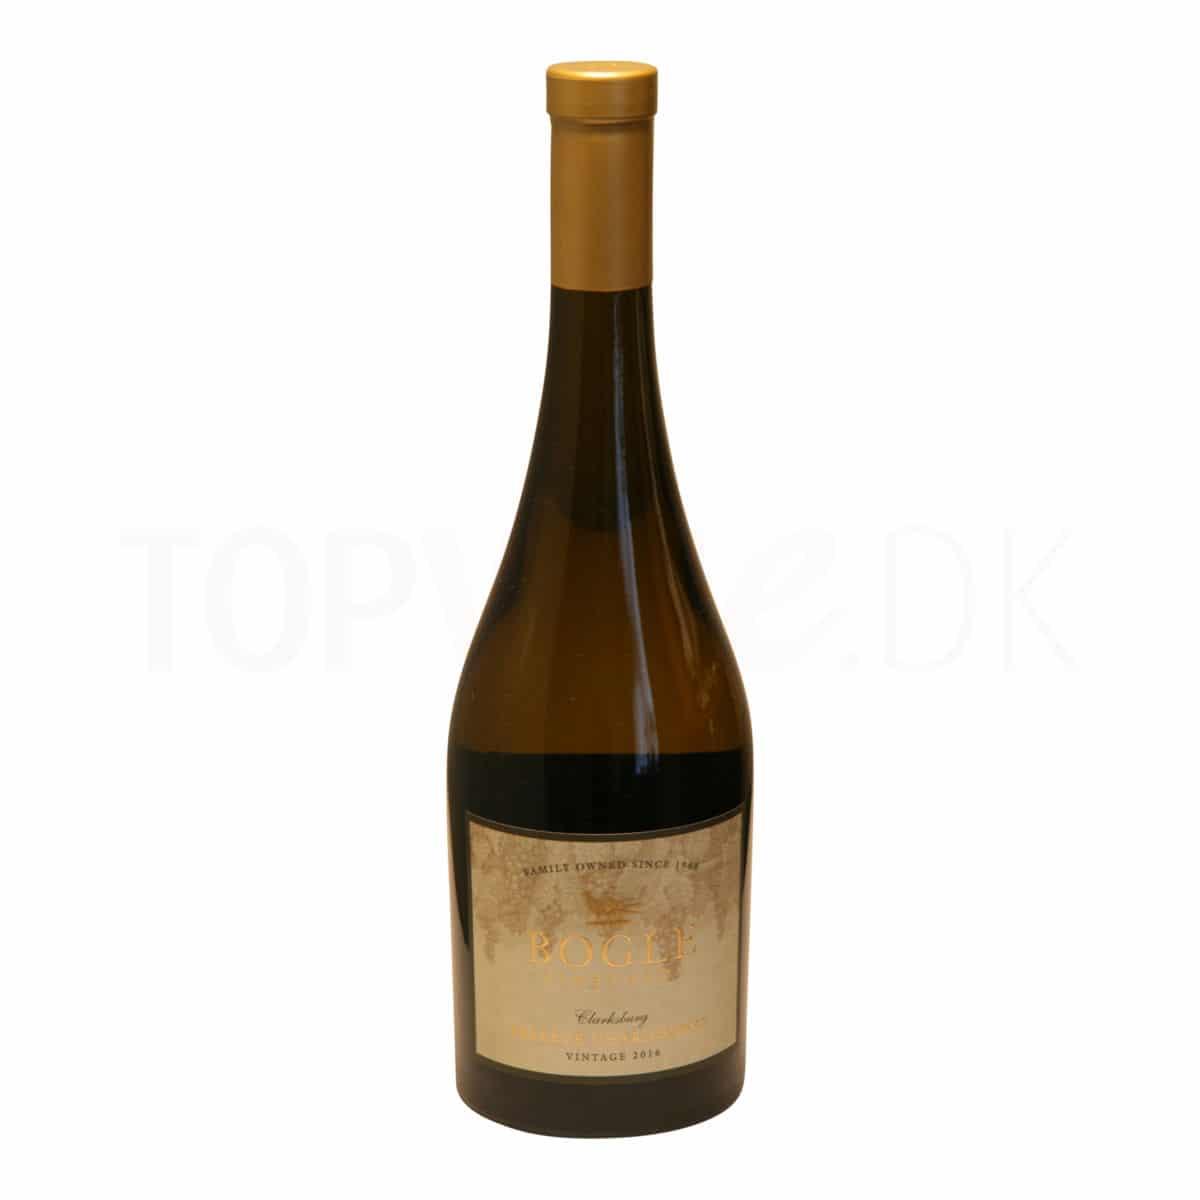 Topvine Bogle Chardonnay reserve 2016